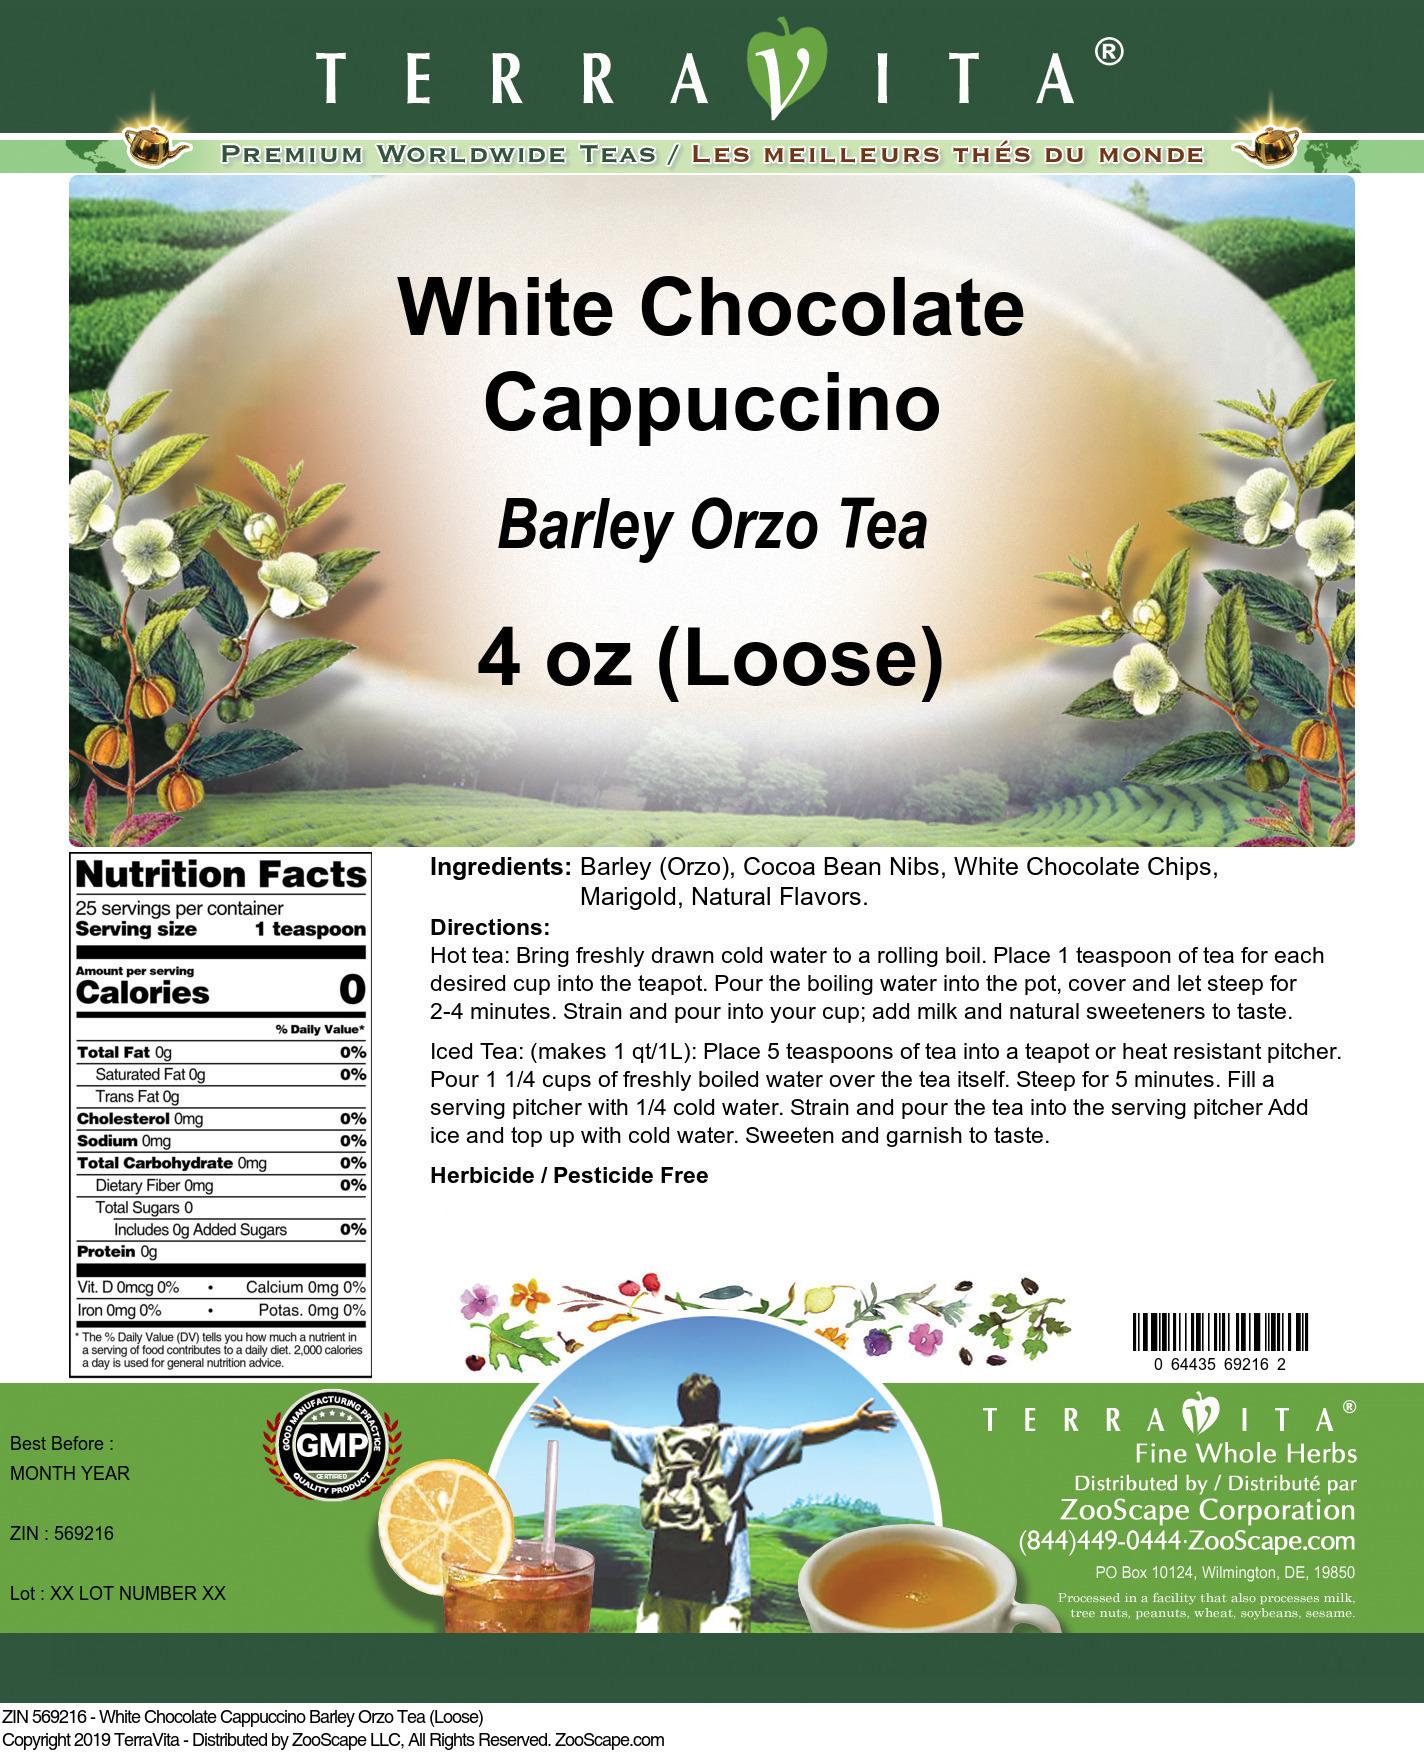 White Chocolate Cappuccino Barley Orzo Tea (Loose)